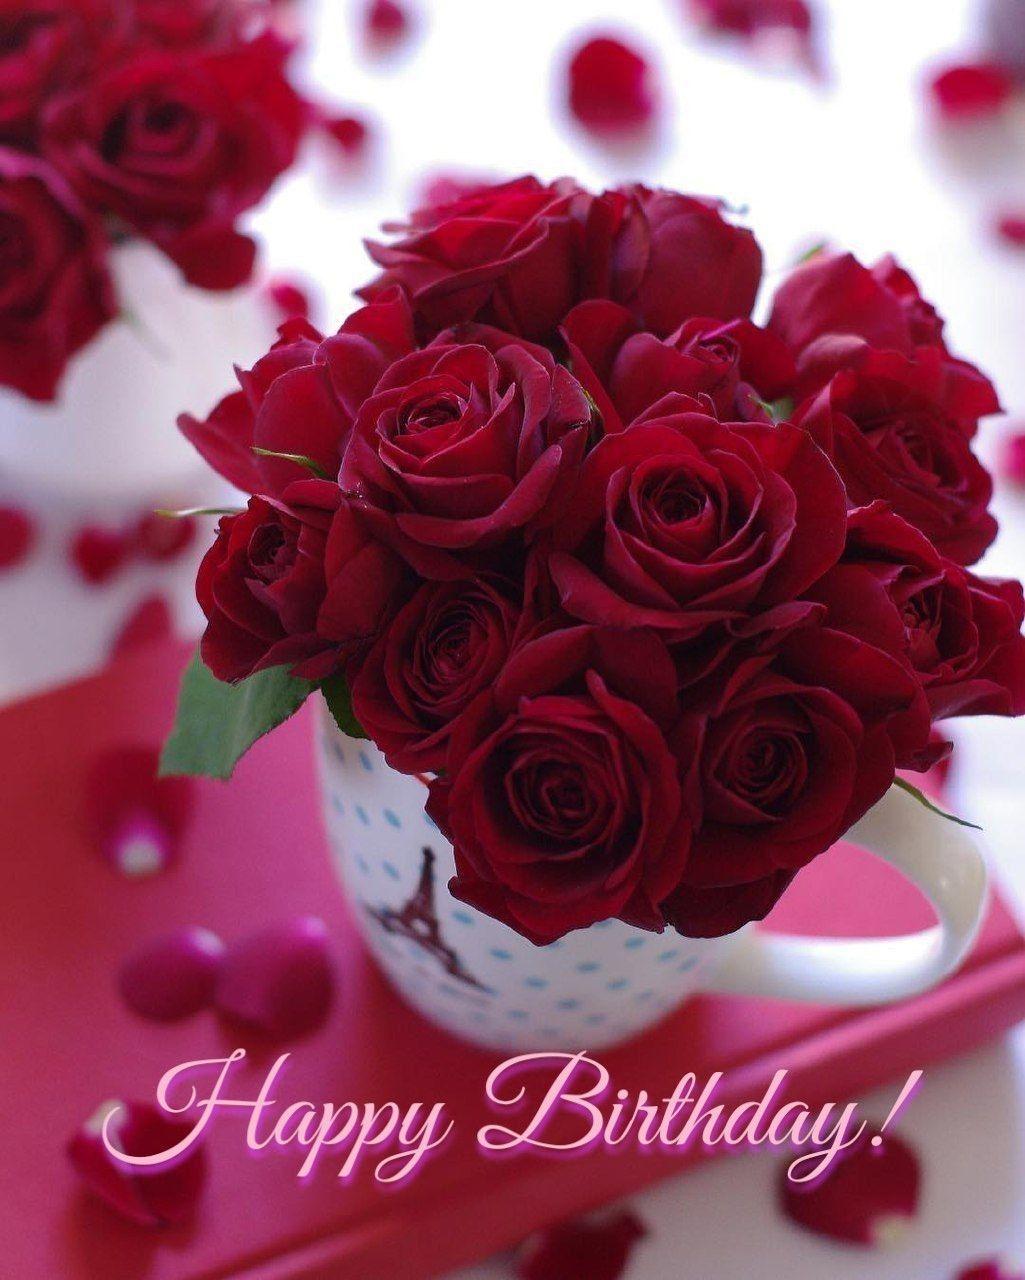 Pin By Nonglak Jantaraprapa On Happy Birthday Happy Birthday Flower Birthday Flowers Bouquet Sunday Rose